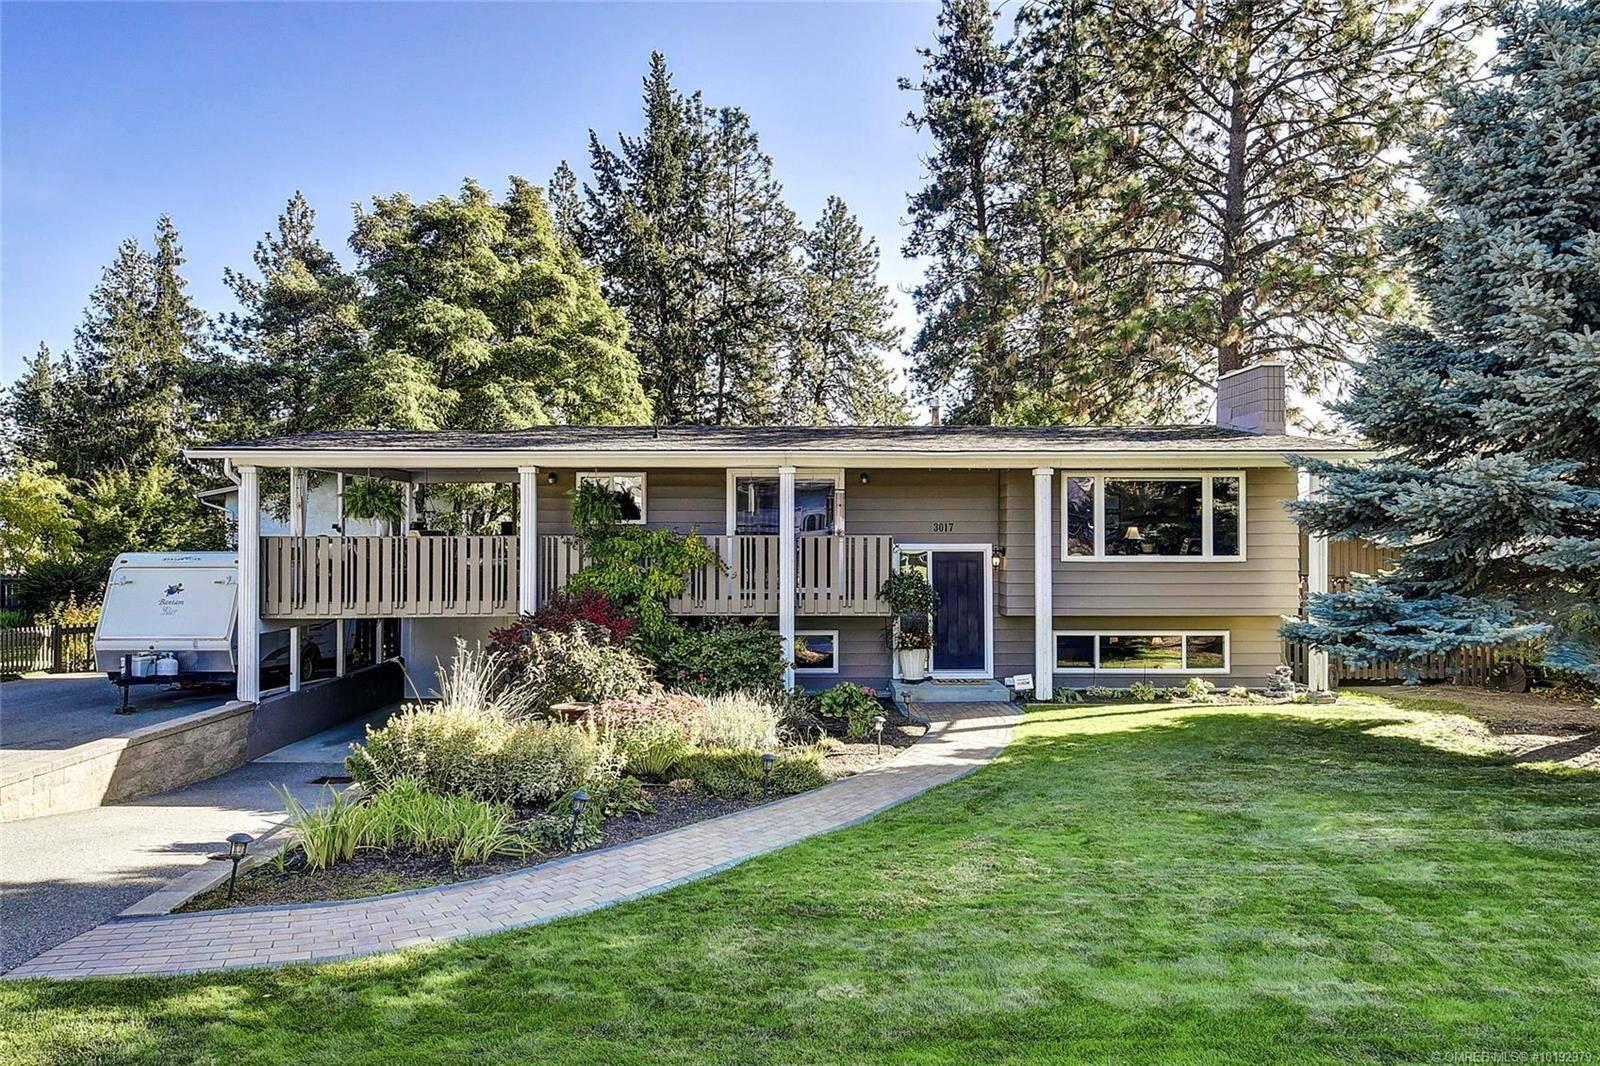 House for sale at 3017 Mcbain Rd West Kelowna British Columbia - MLS: 10192979